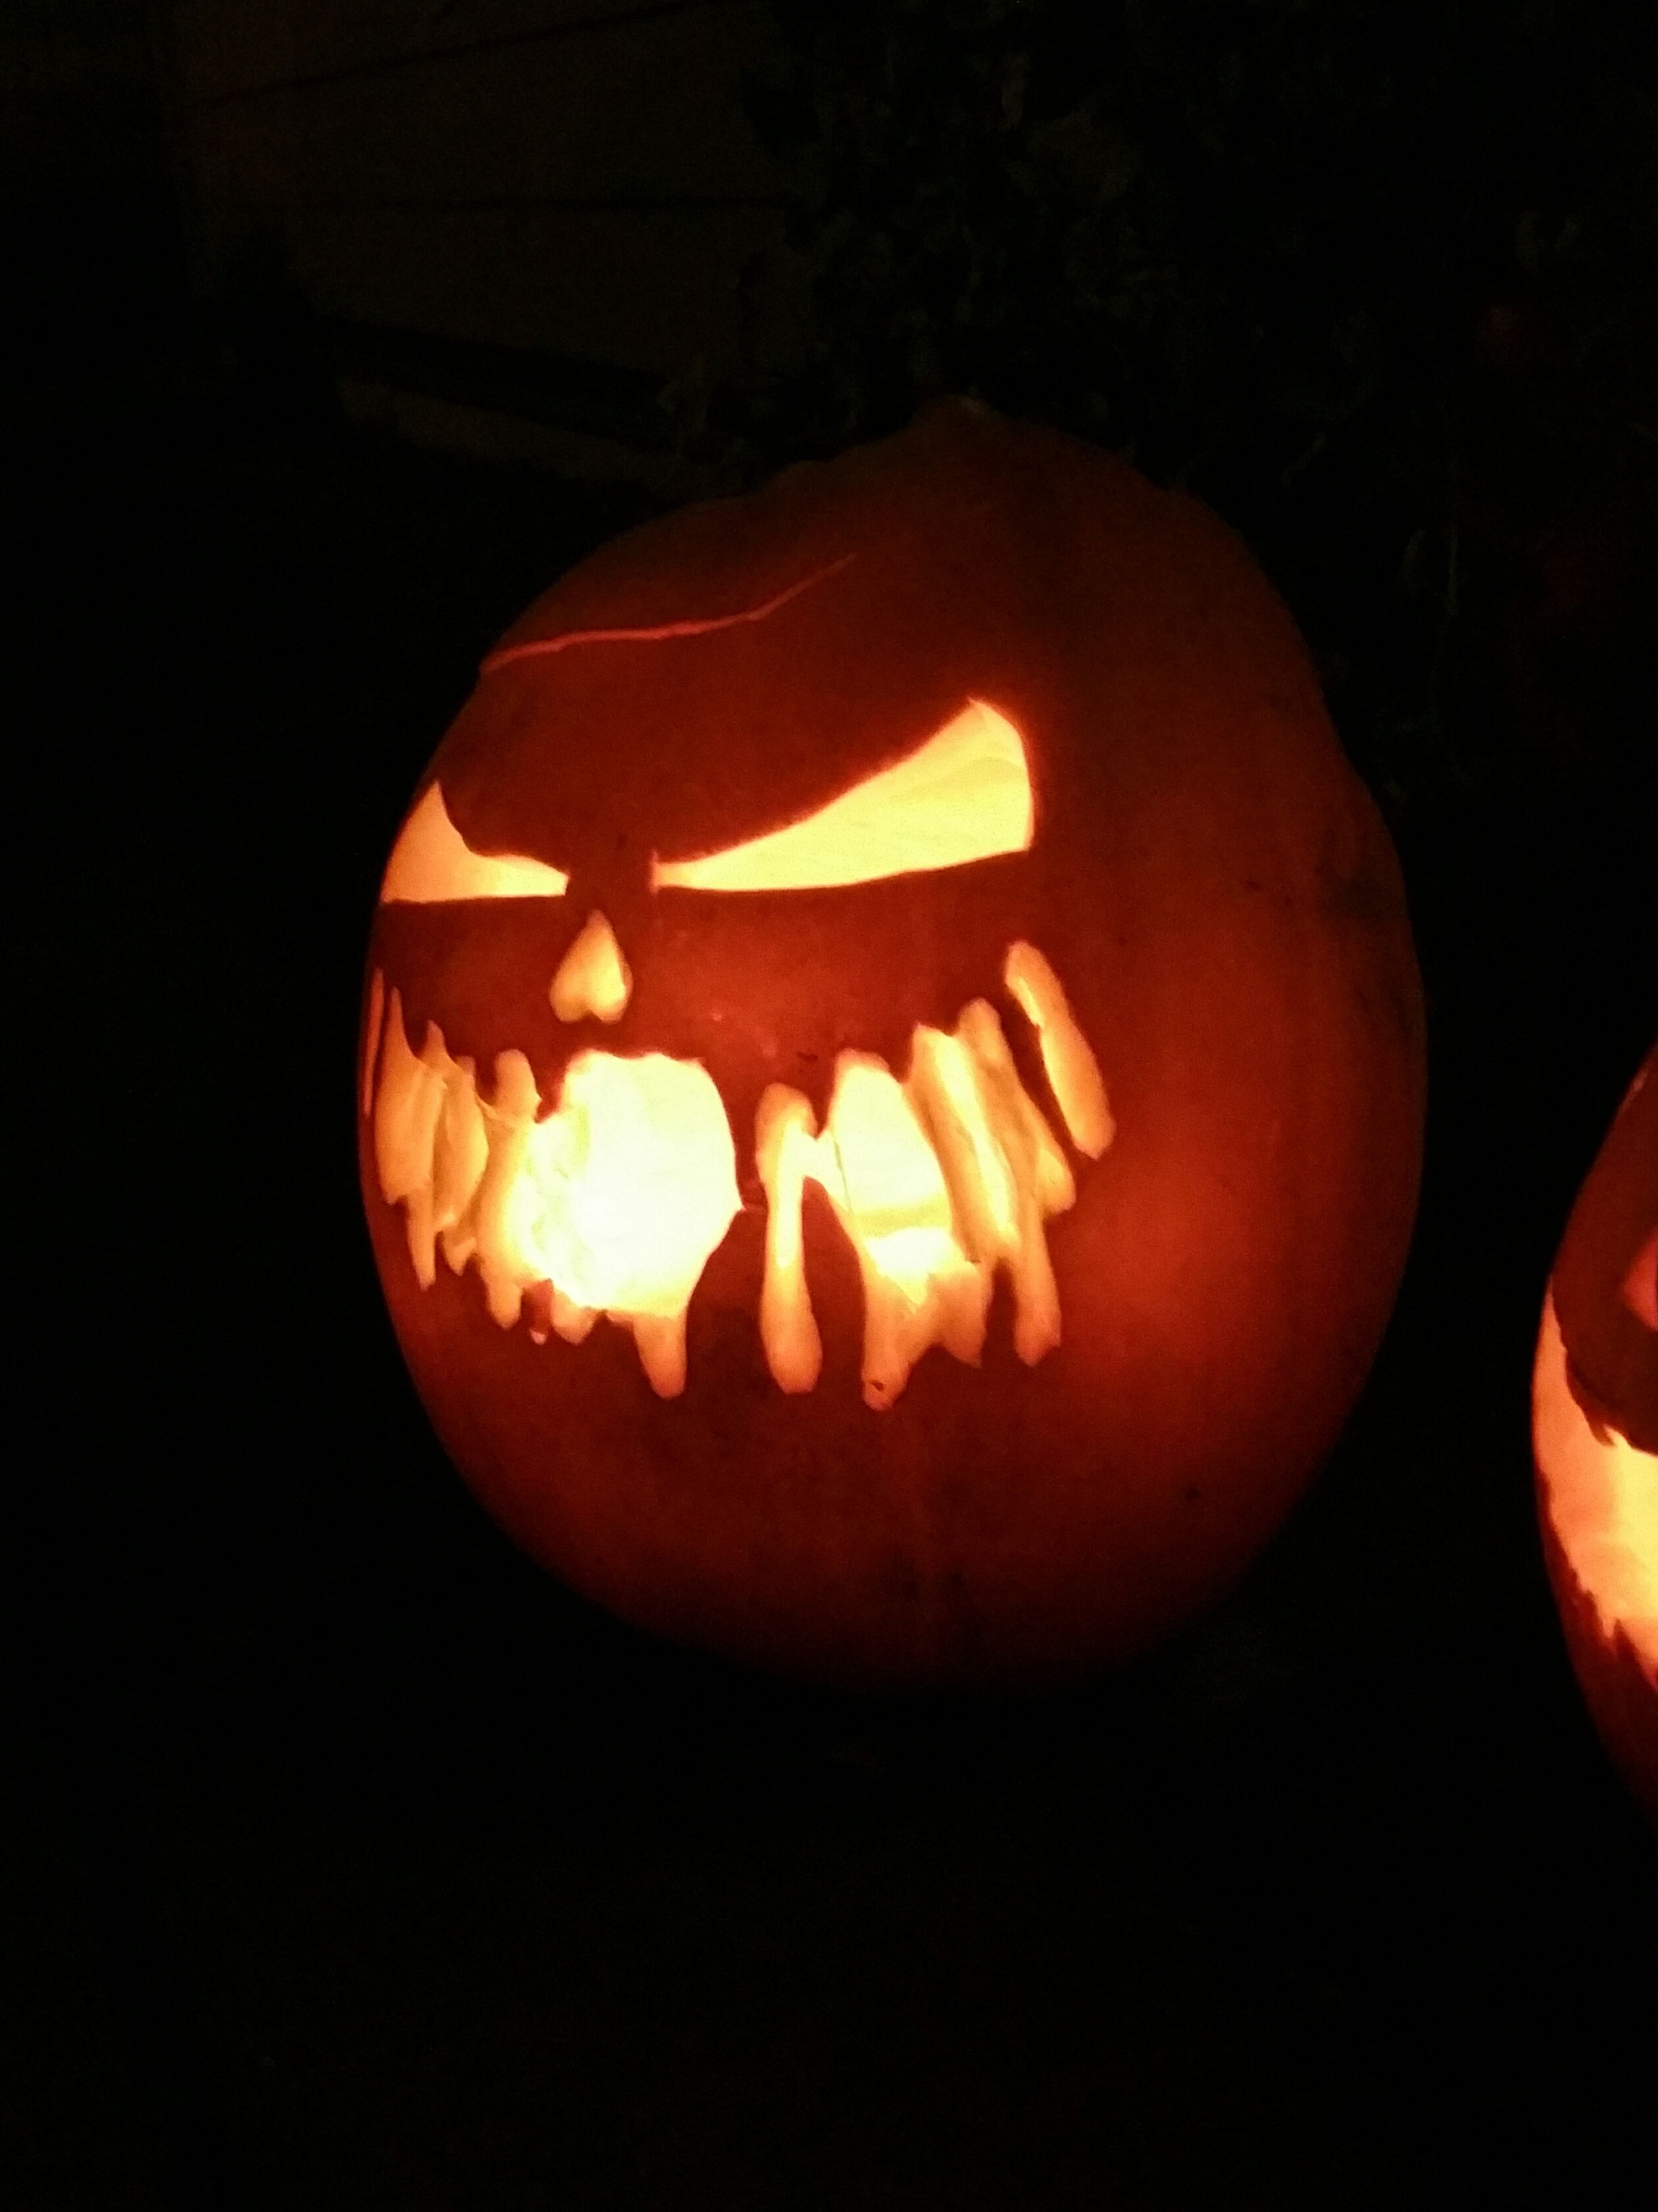 halloween, pumpkin, anthropomorphic face, illuminated, no people, night, black background, close-up, jack o lantern